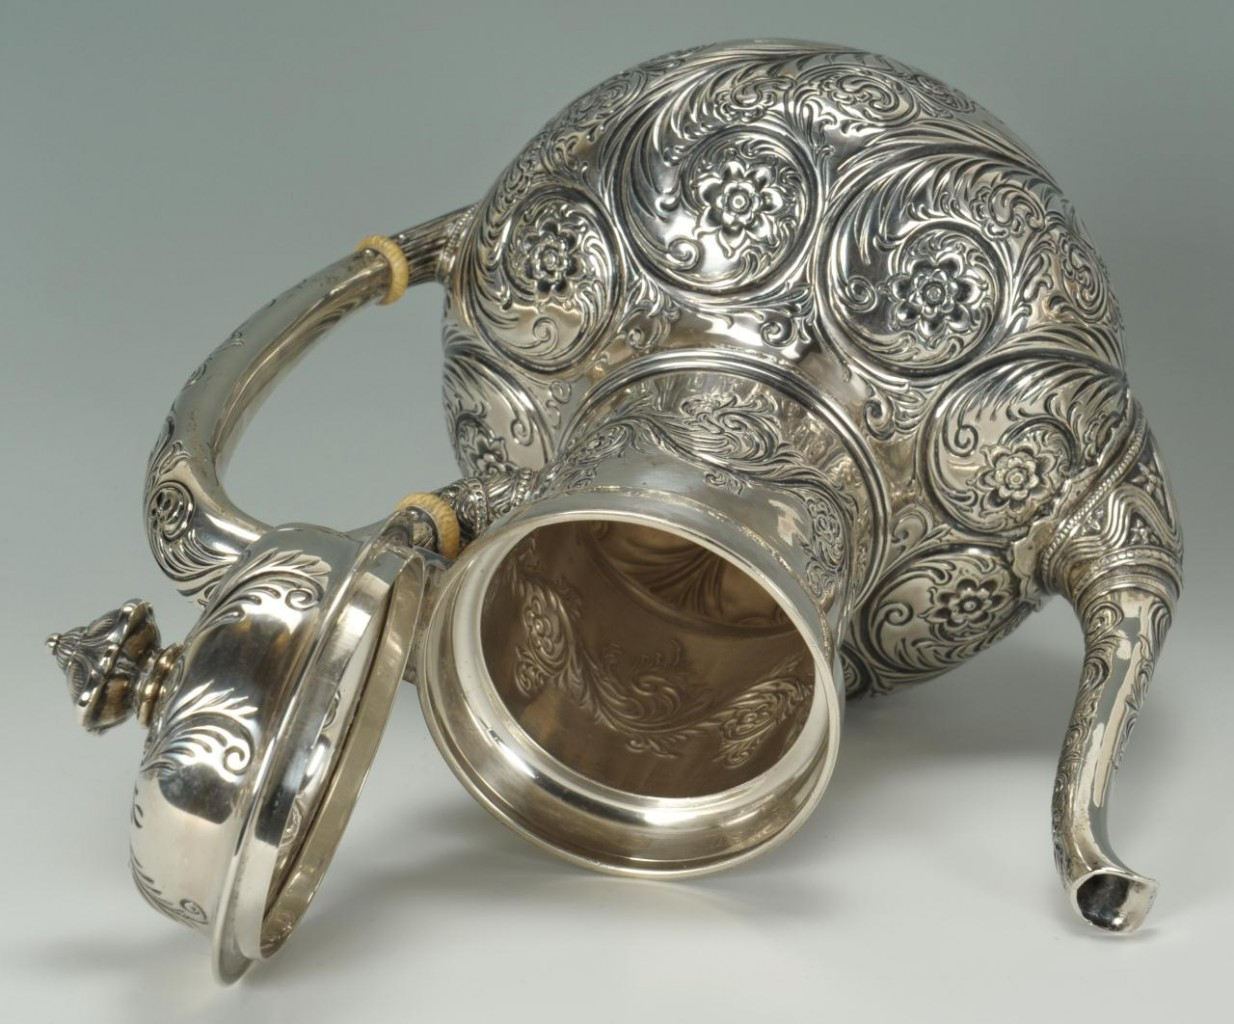 Lot 79: Tiffany Persian Tea and Coffee Service, 5 pcs